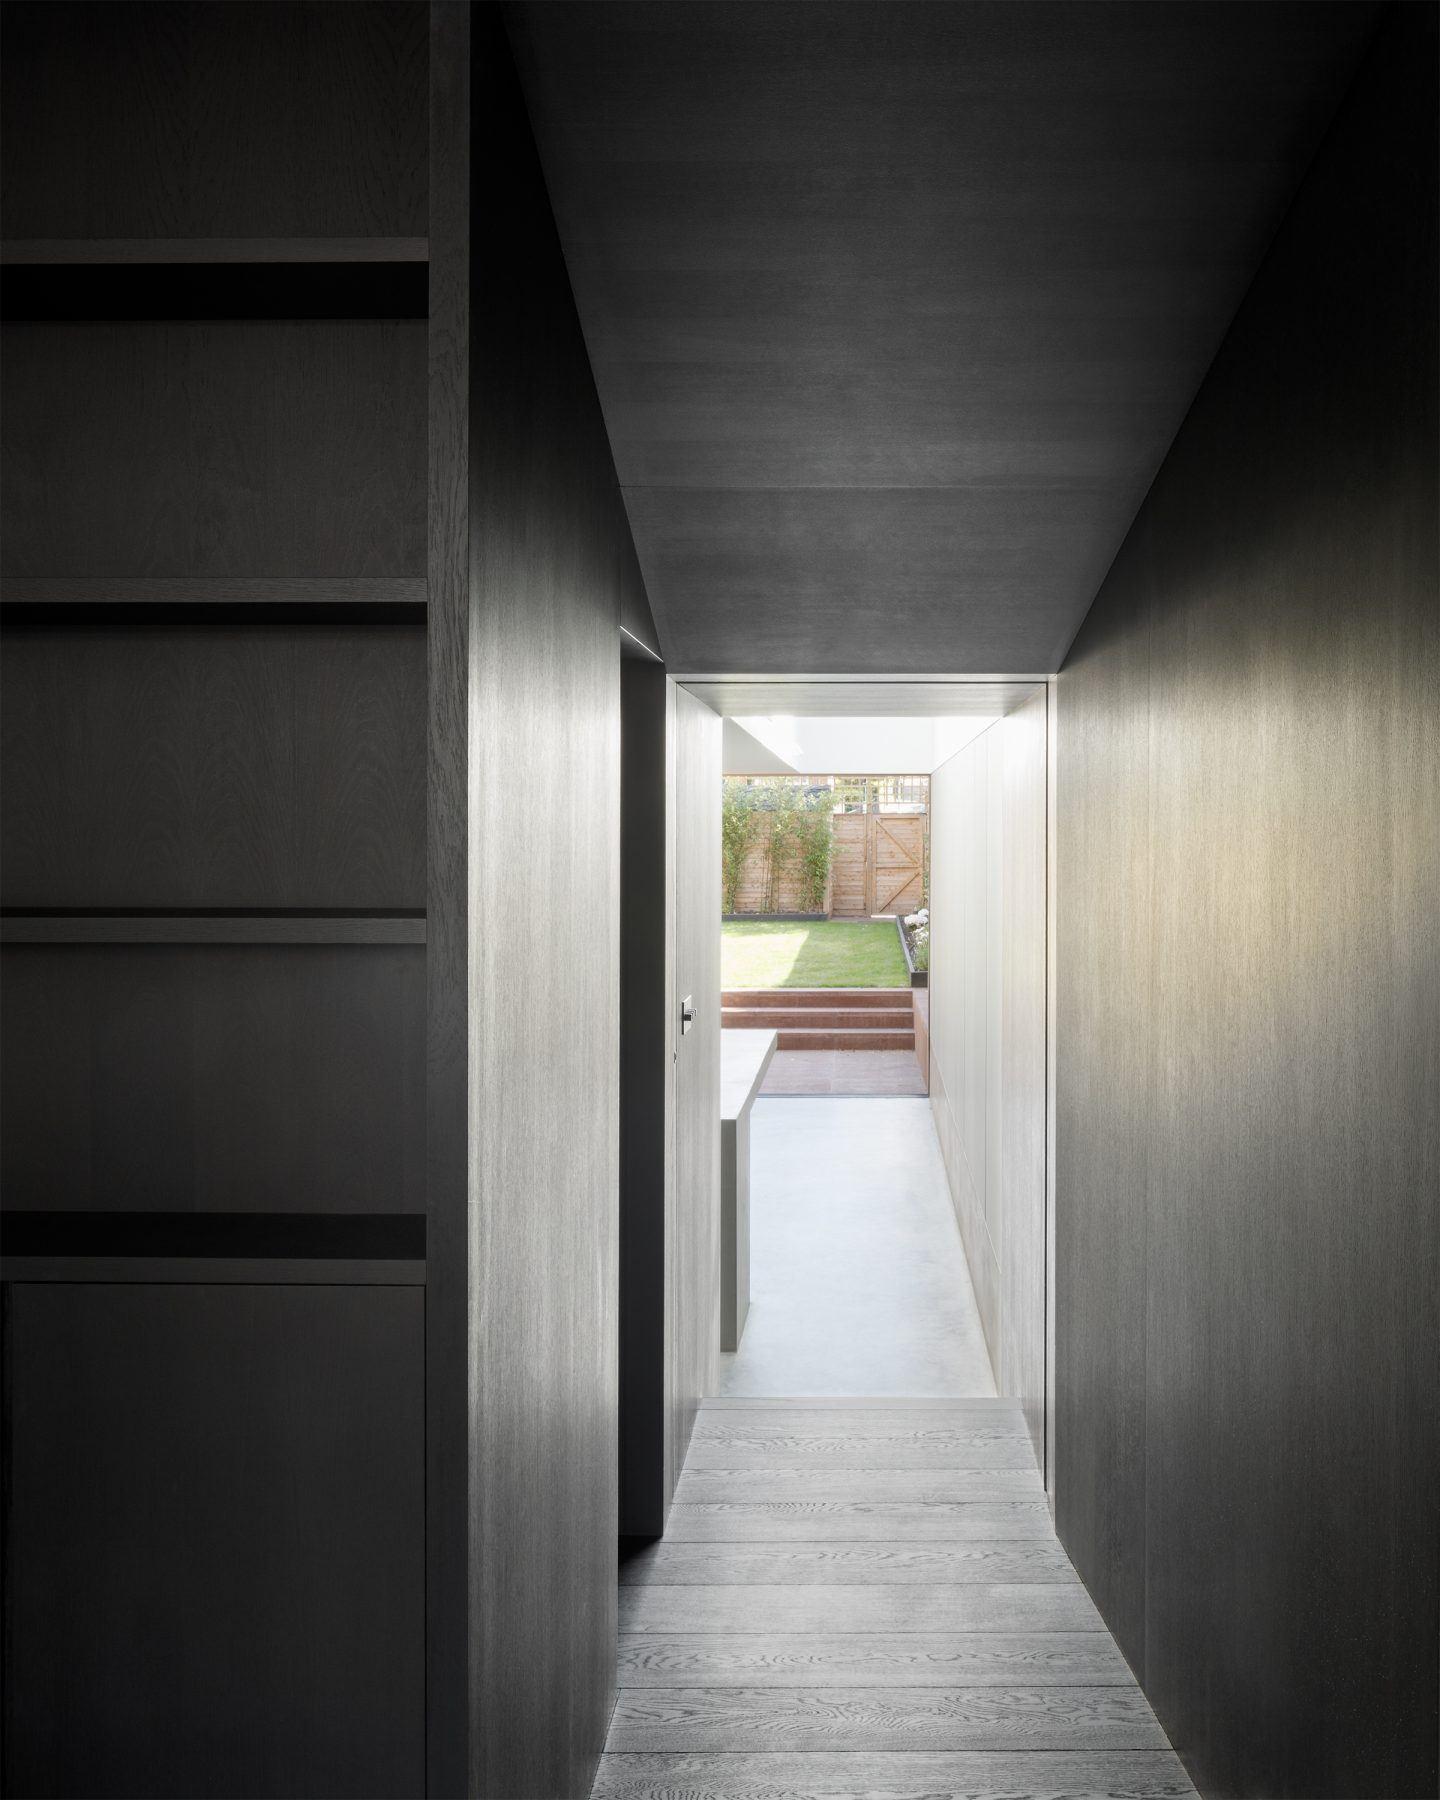 IGNANT-Architecture-Al-Jawad-Pike-Elsley-Road-9